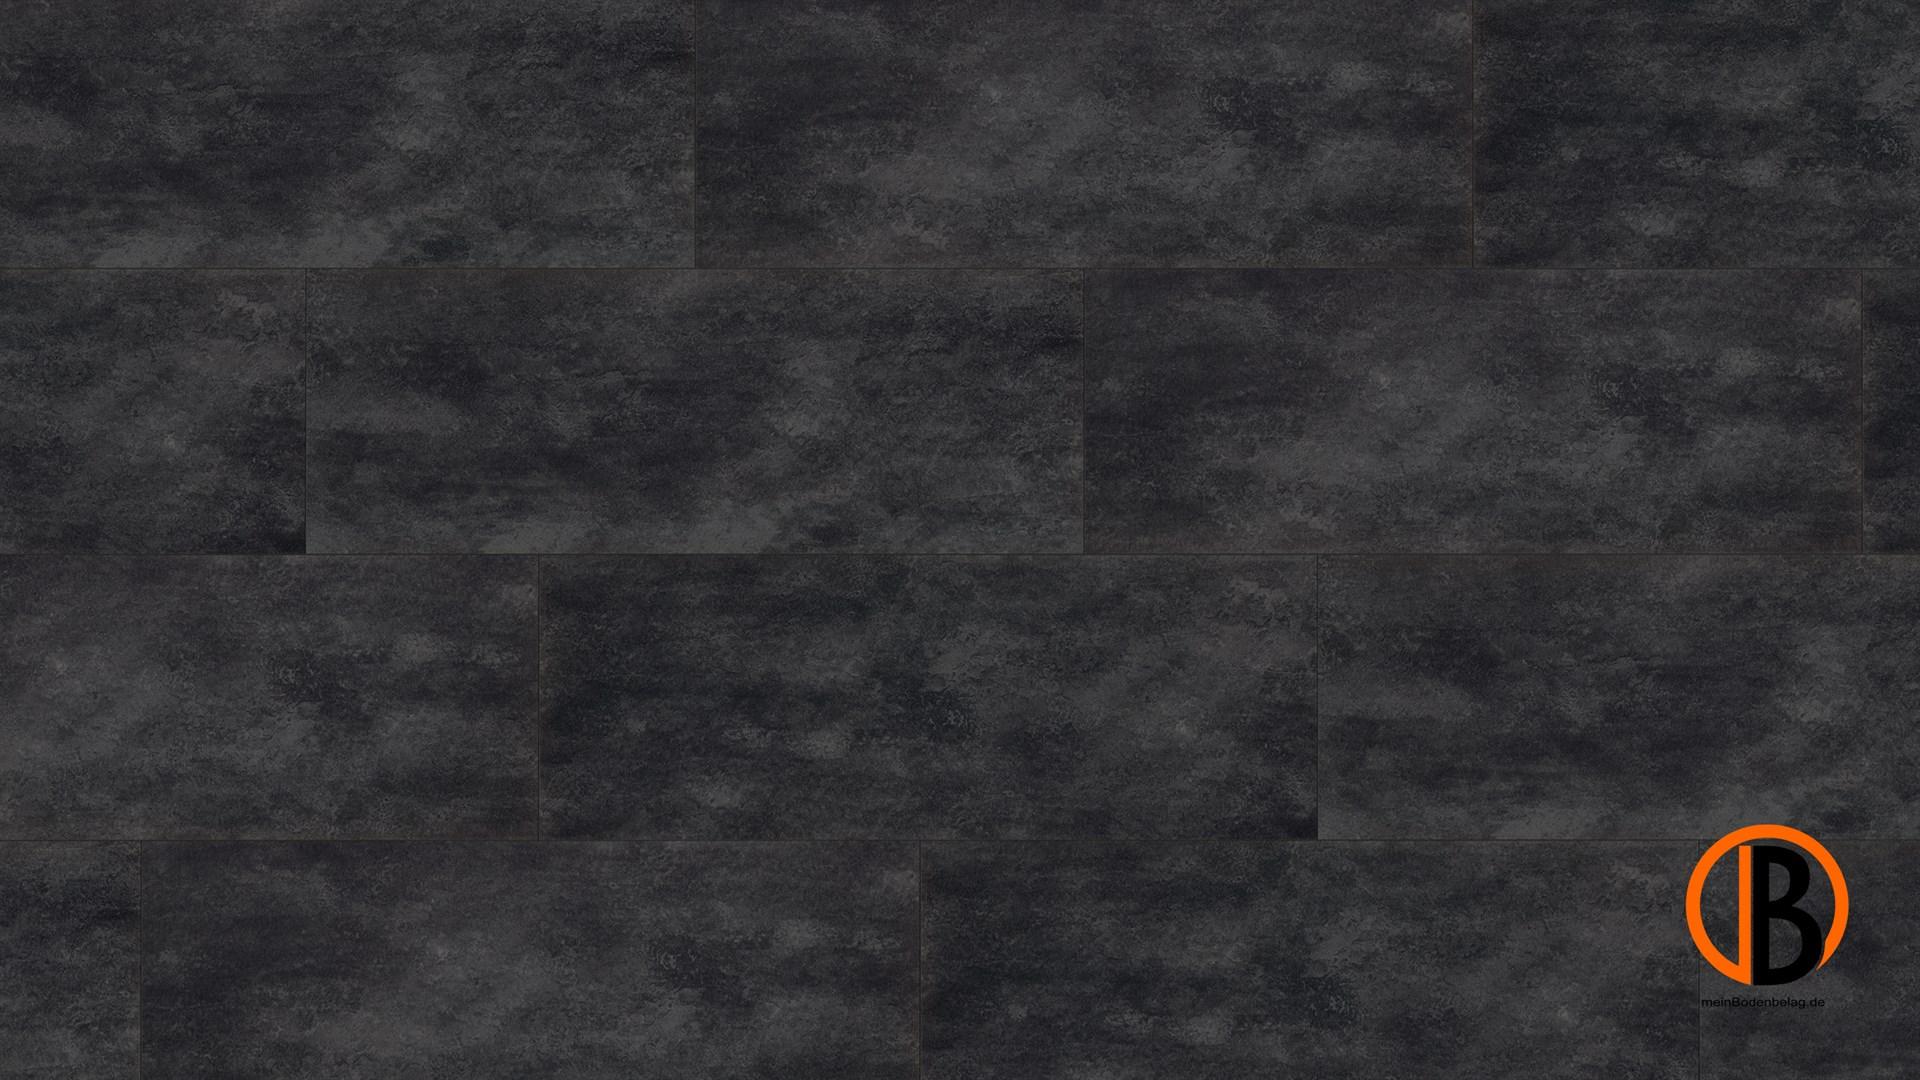 CINQUE KWG DESIGNERVINYL ANTIGUA STONE SHEETS | 10000280;0 | Bild 1